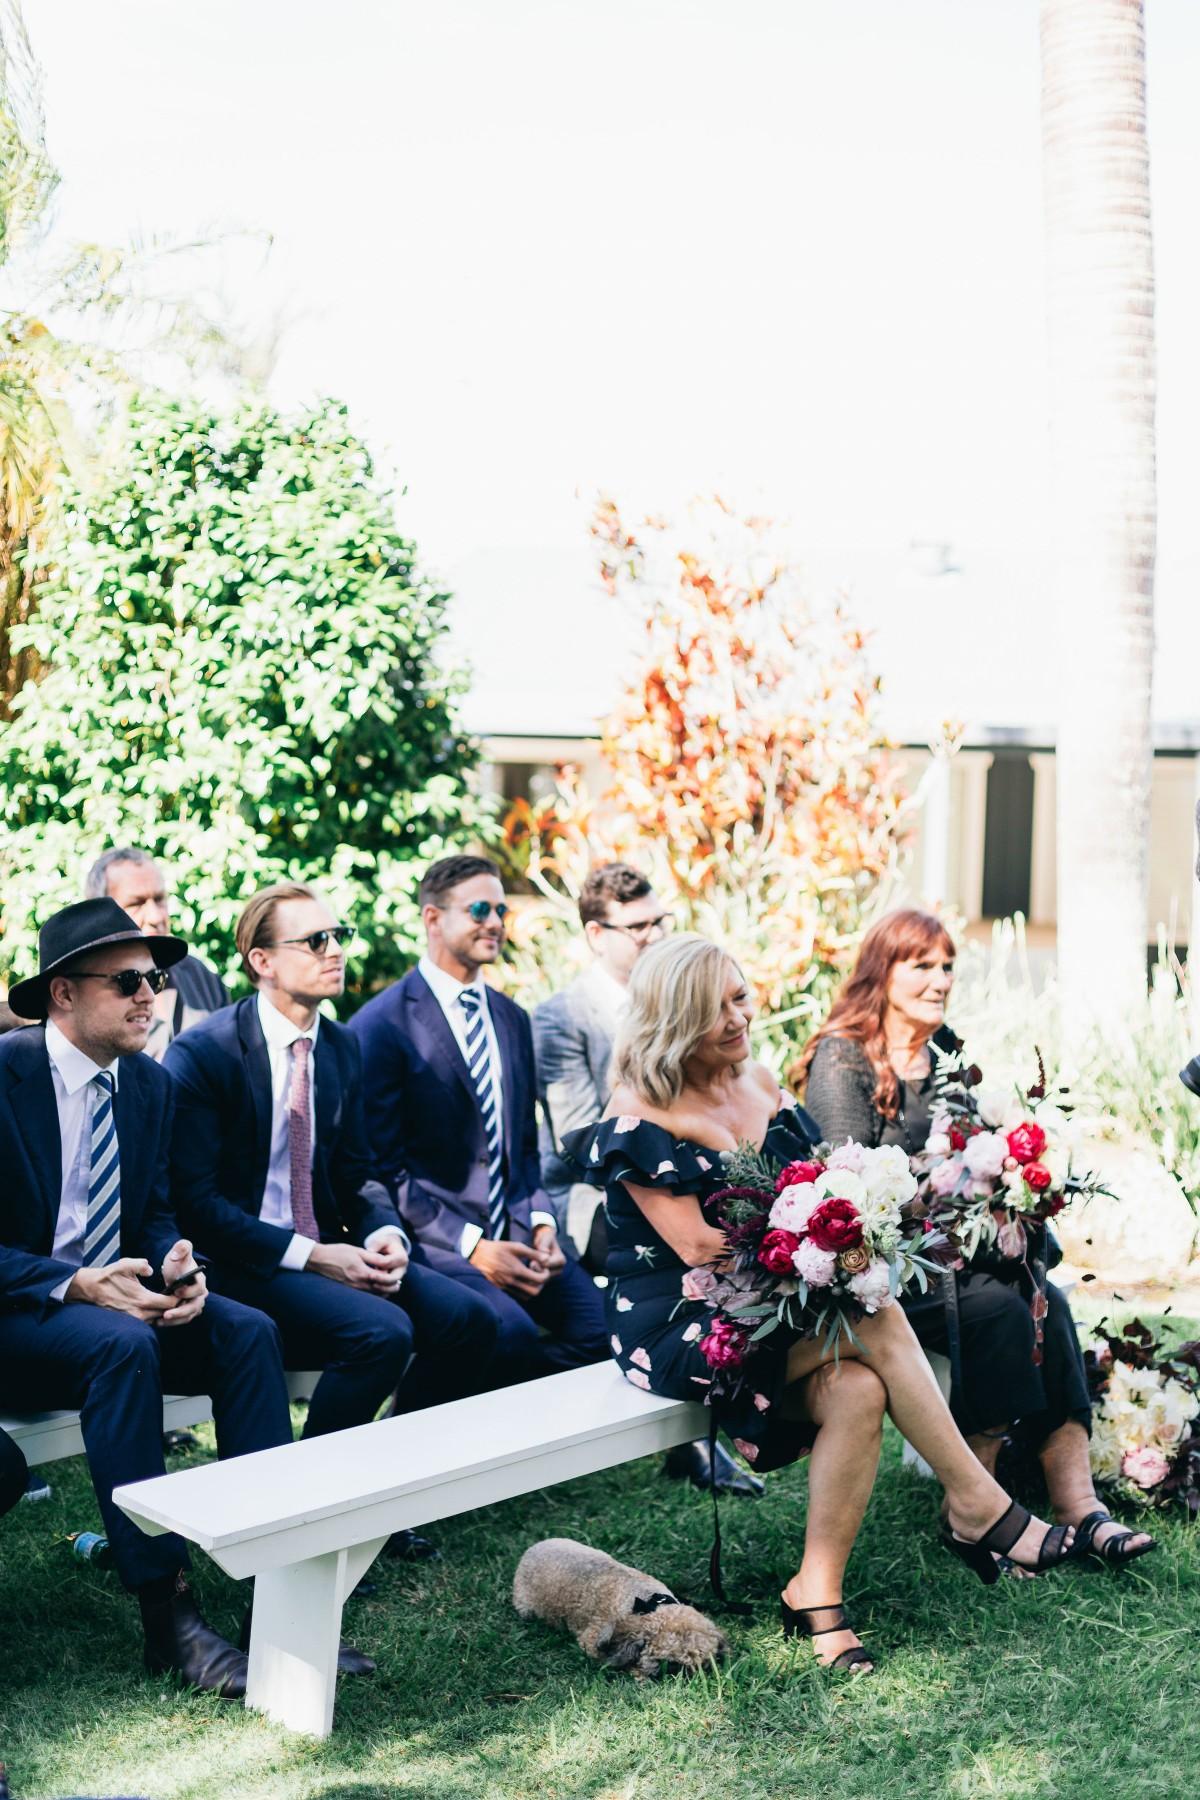 Kathy Glenn Newrybar Byron Bay Wedding Venue Hampton Event Hire23.jpg